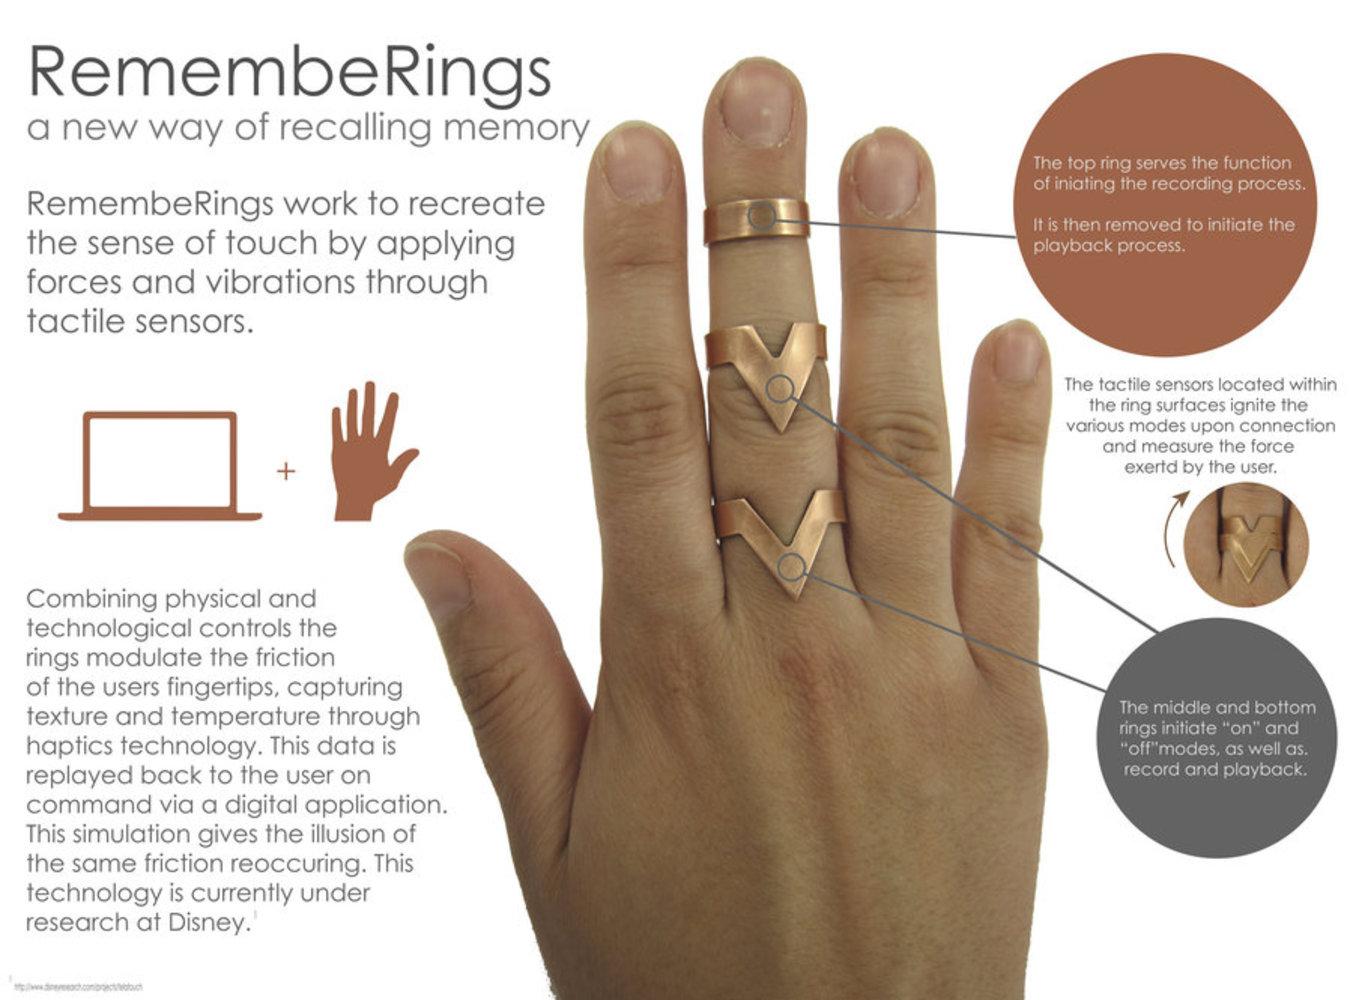 Rememberings copy.thumb